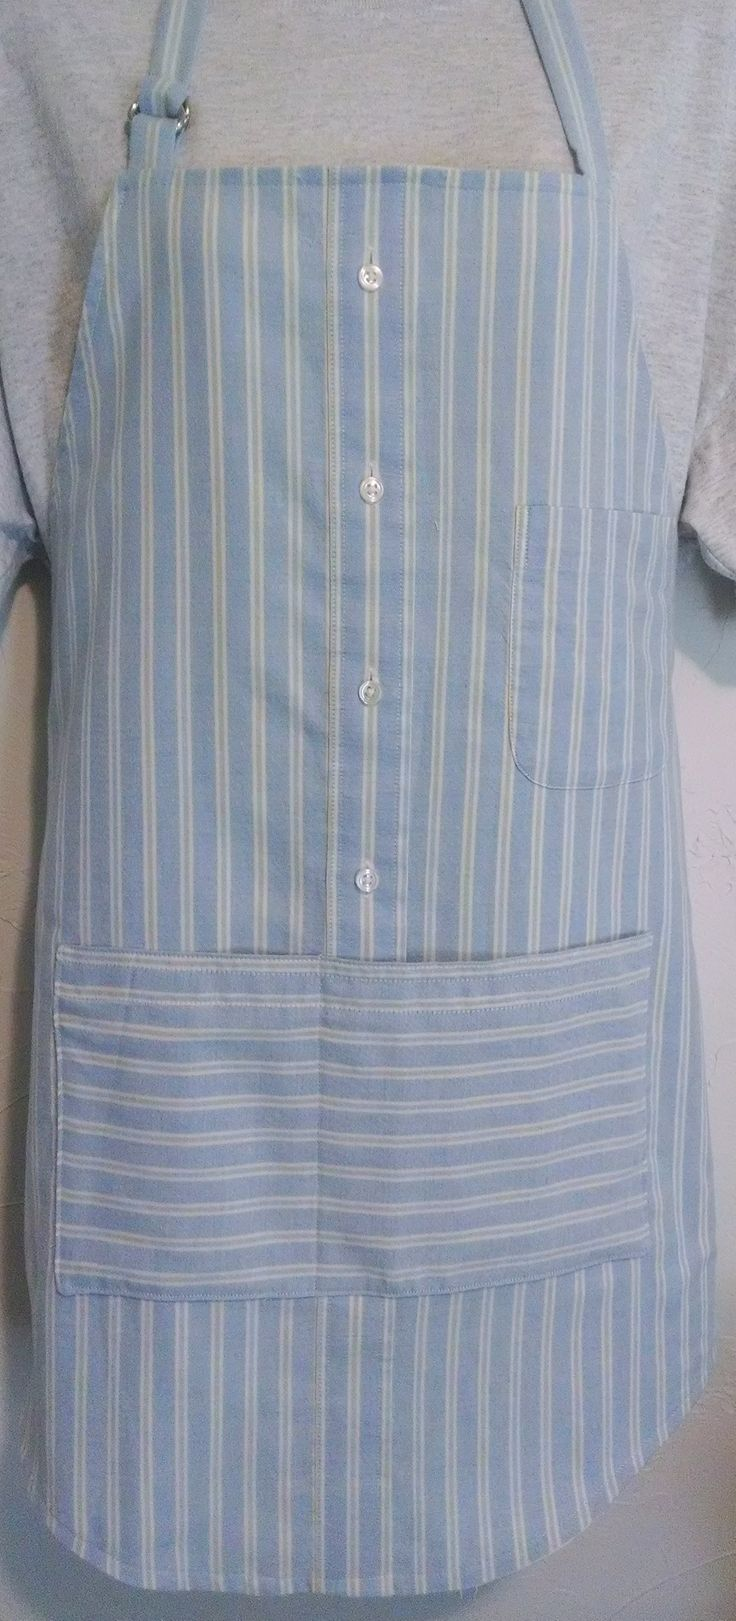 Blue apron quality auditor - Repurposed Shirt Apron